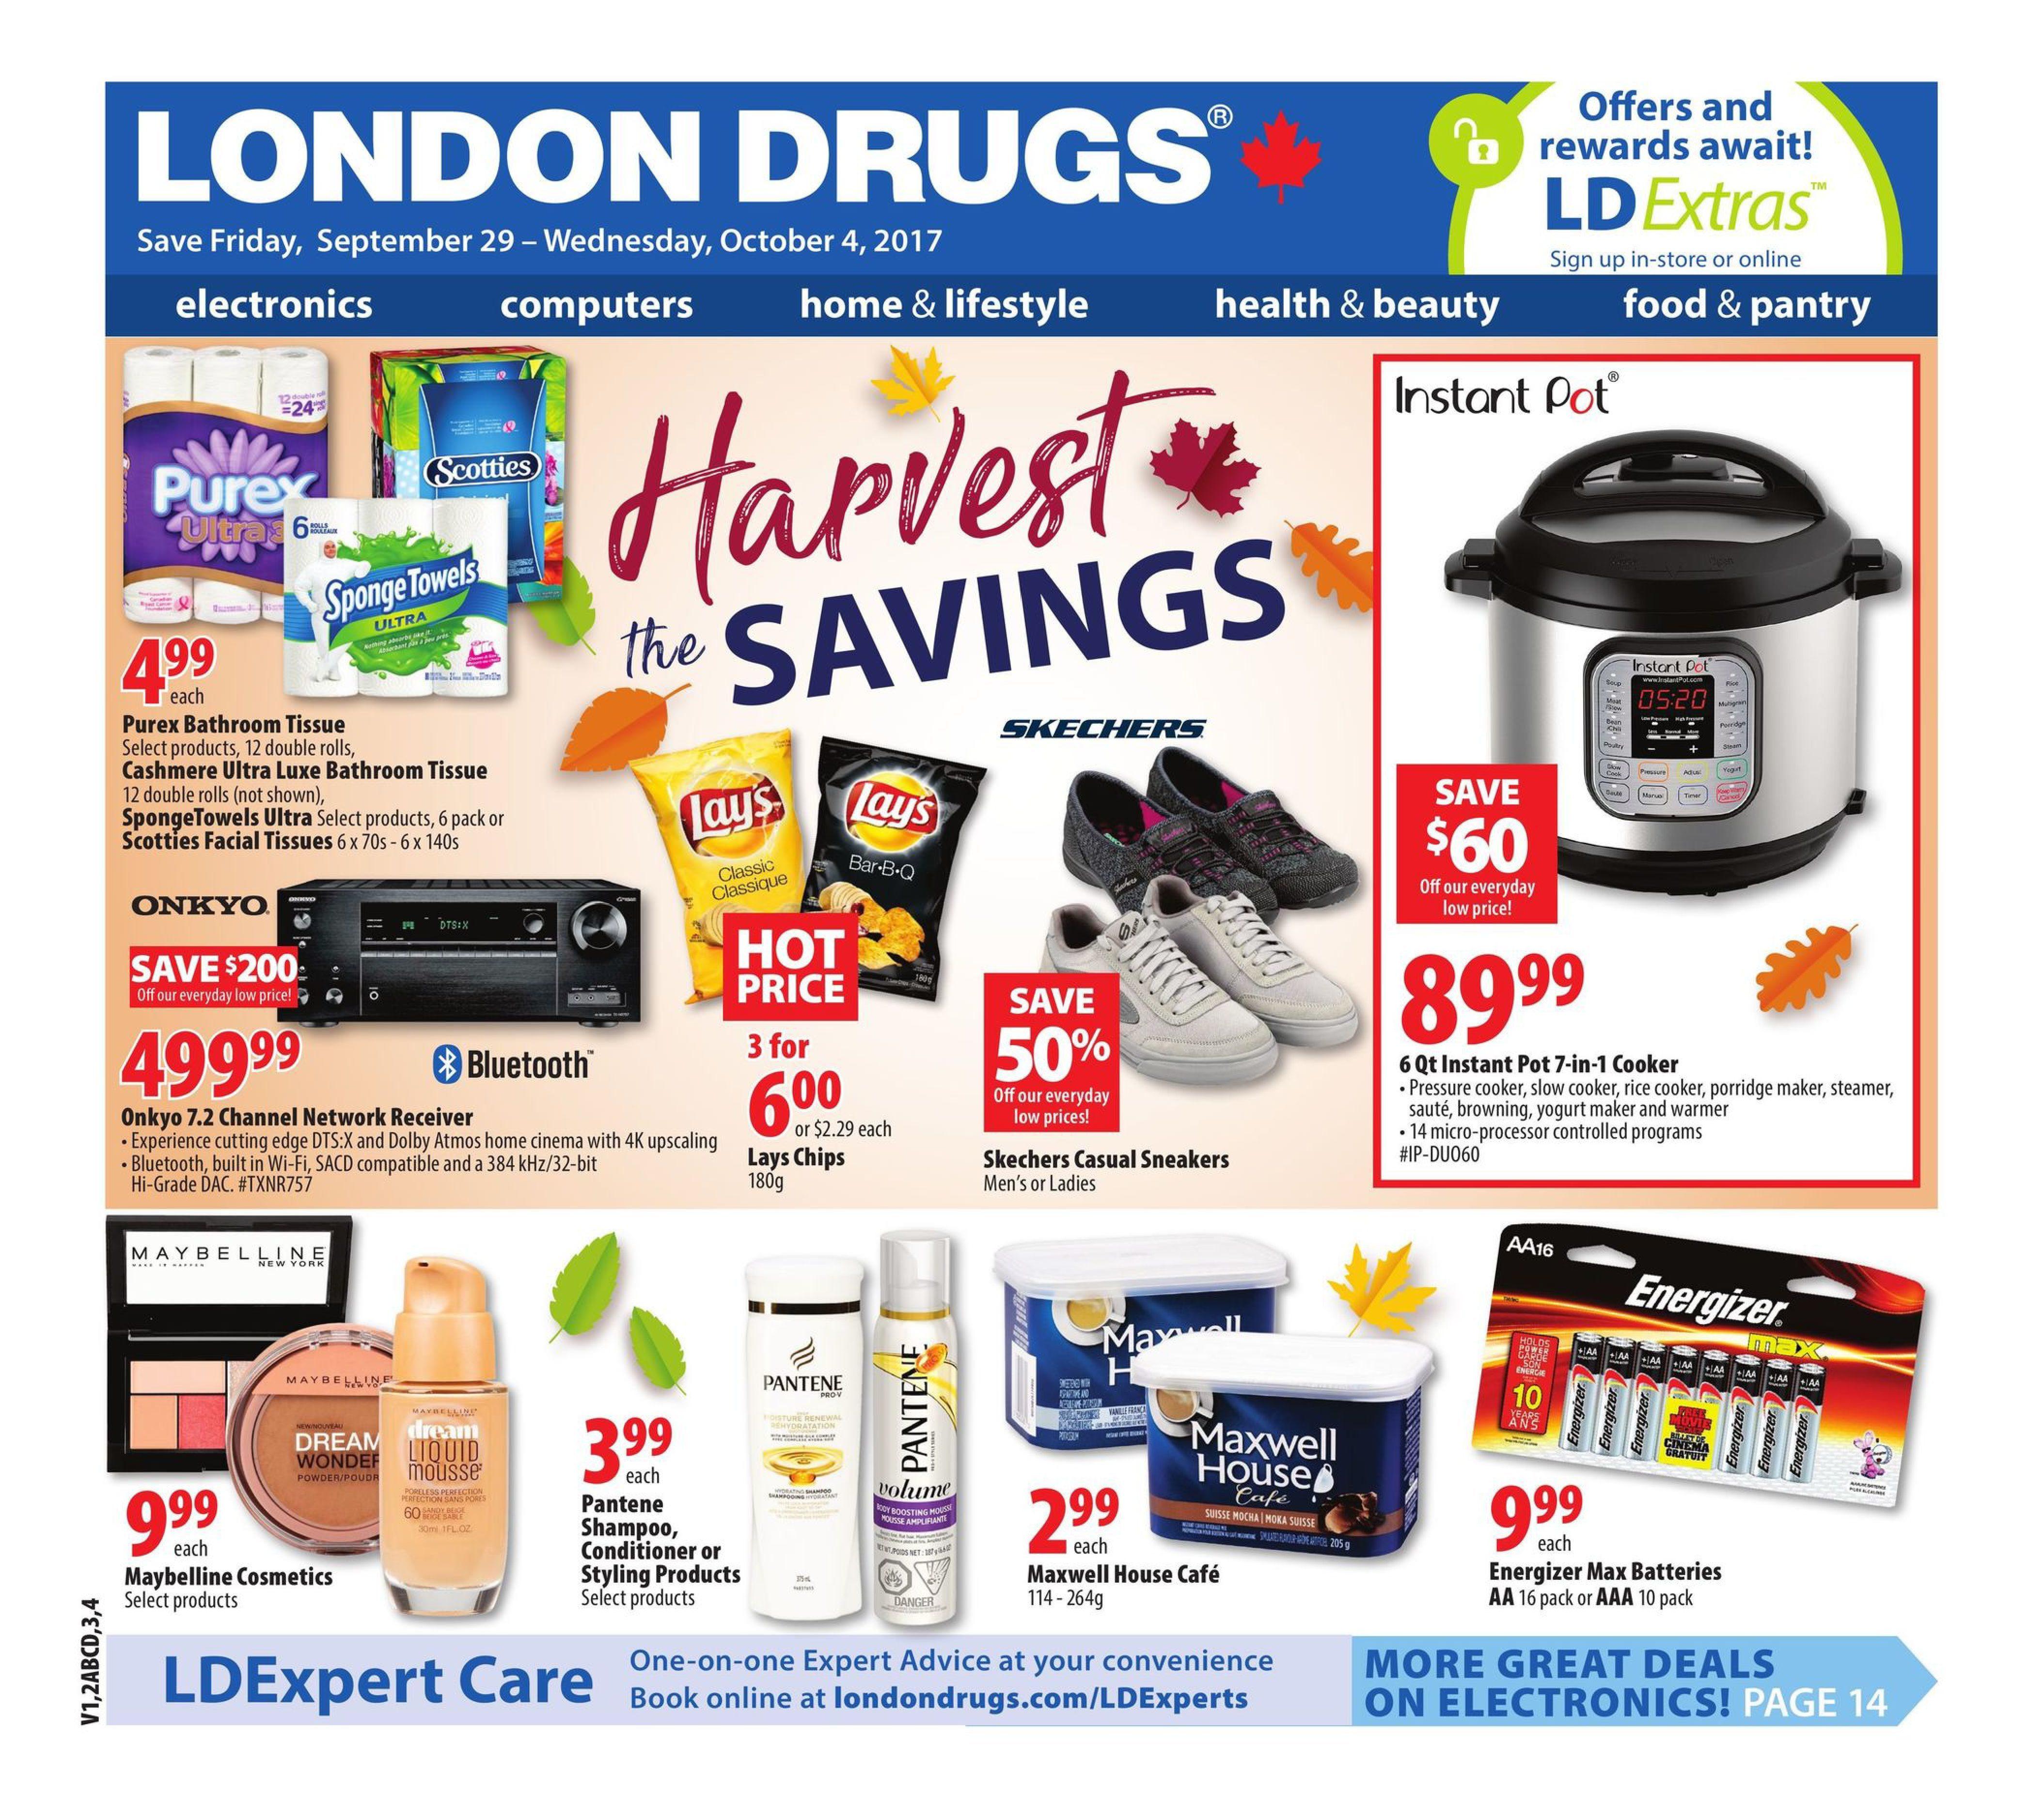 London Drugs Weekly Flyer General Harvest The Savings Sep 29 Fancy Feast Classic Wet Fish Tuna 85g 24 Pcs Free Flashdisk Oct 4